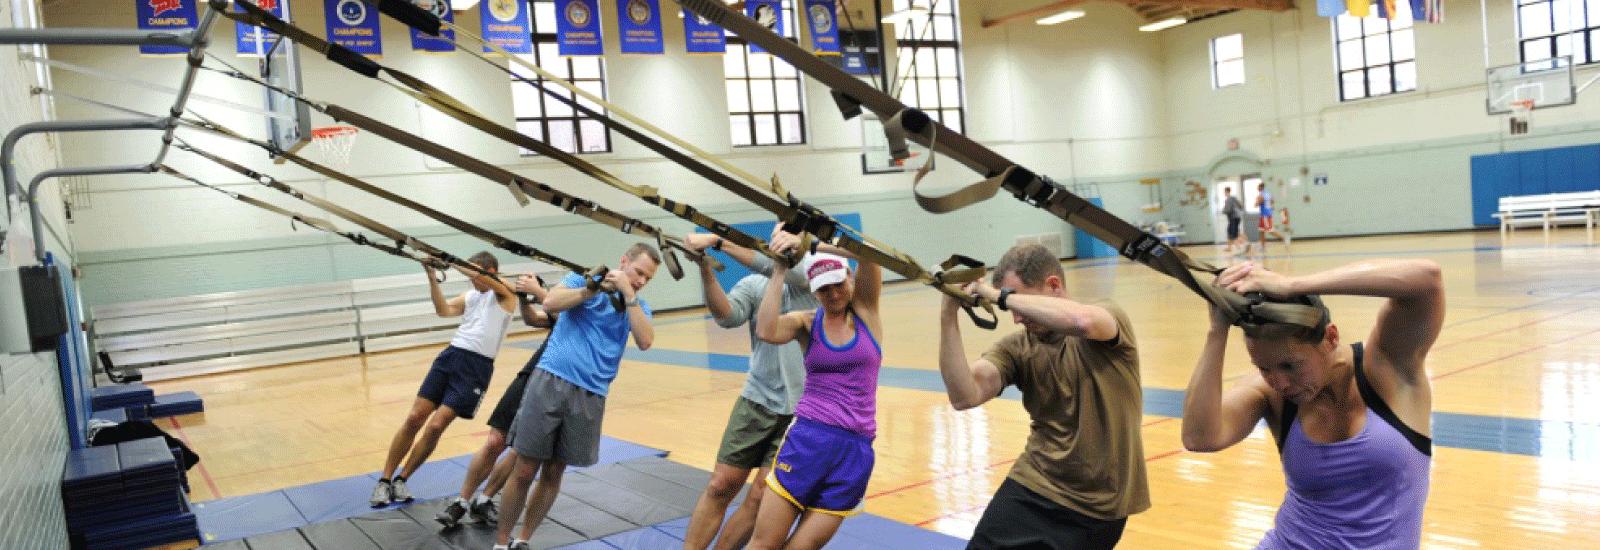 Norfolk Naval Base Gym